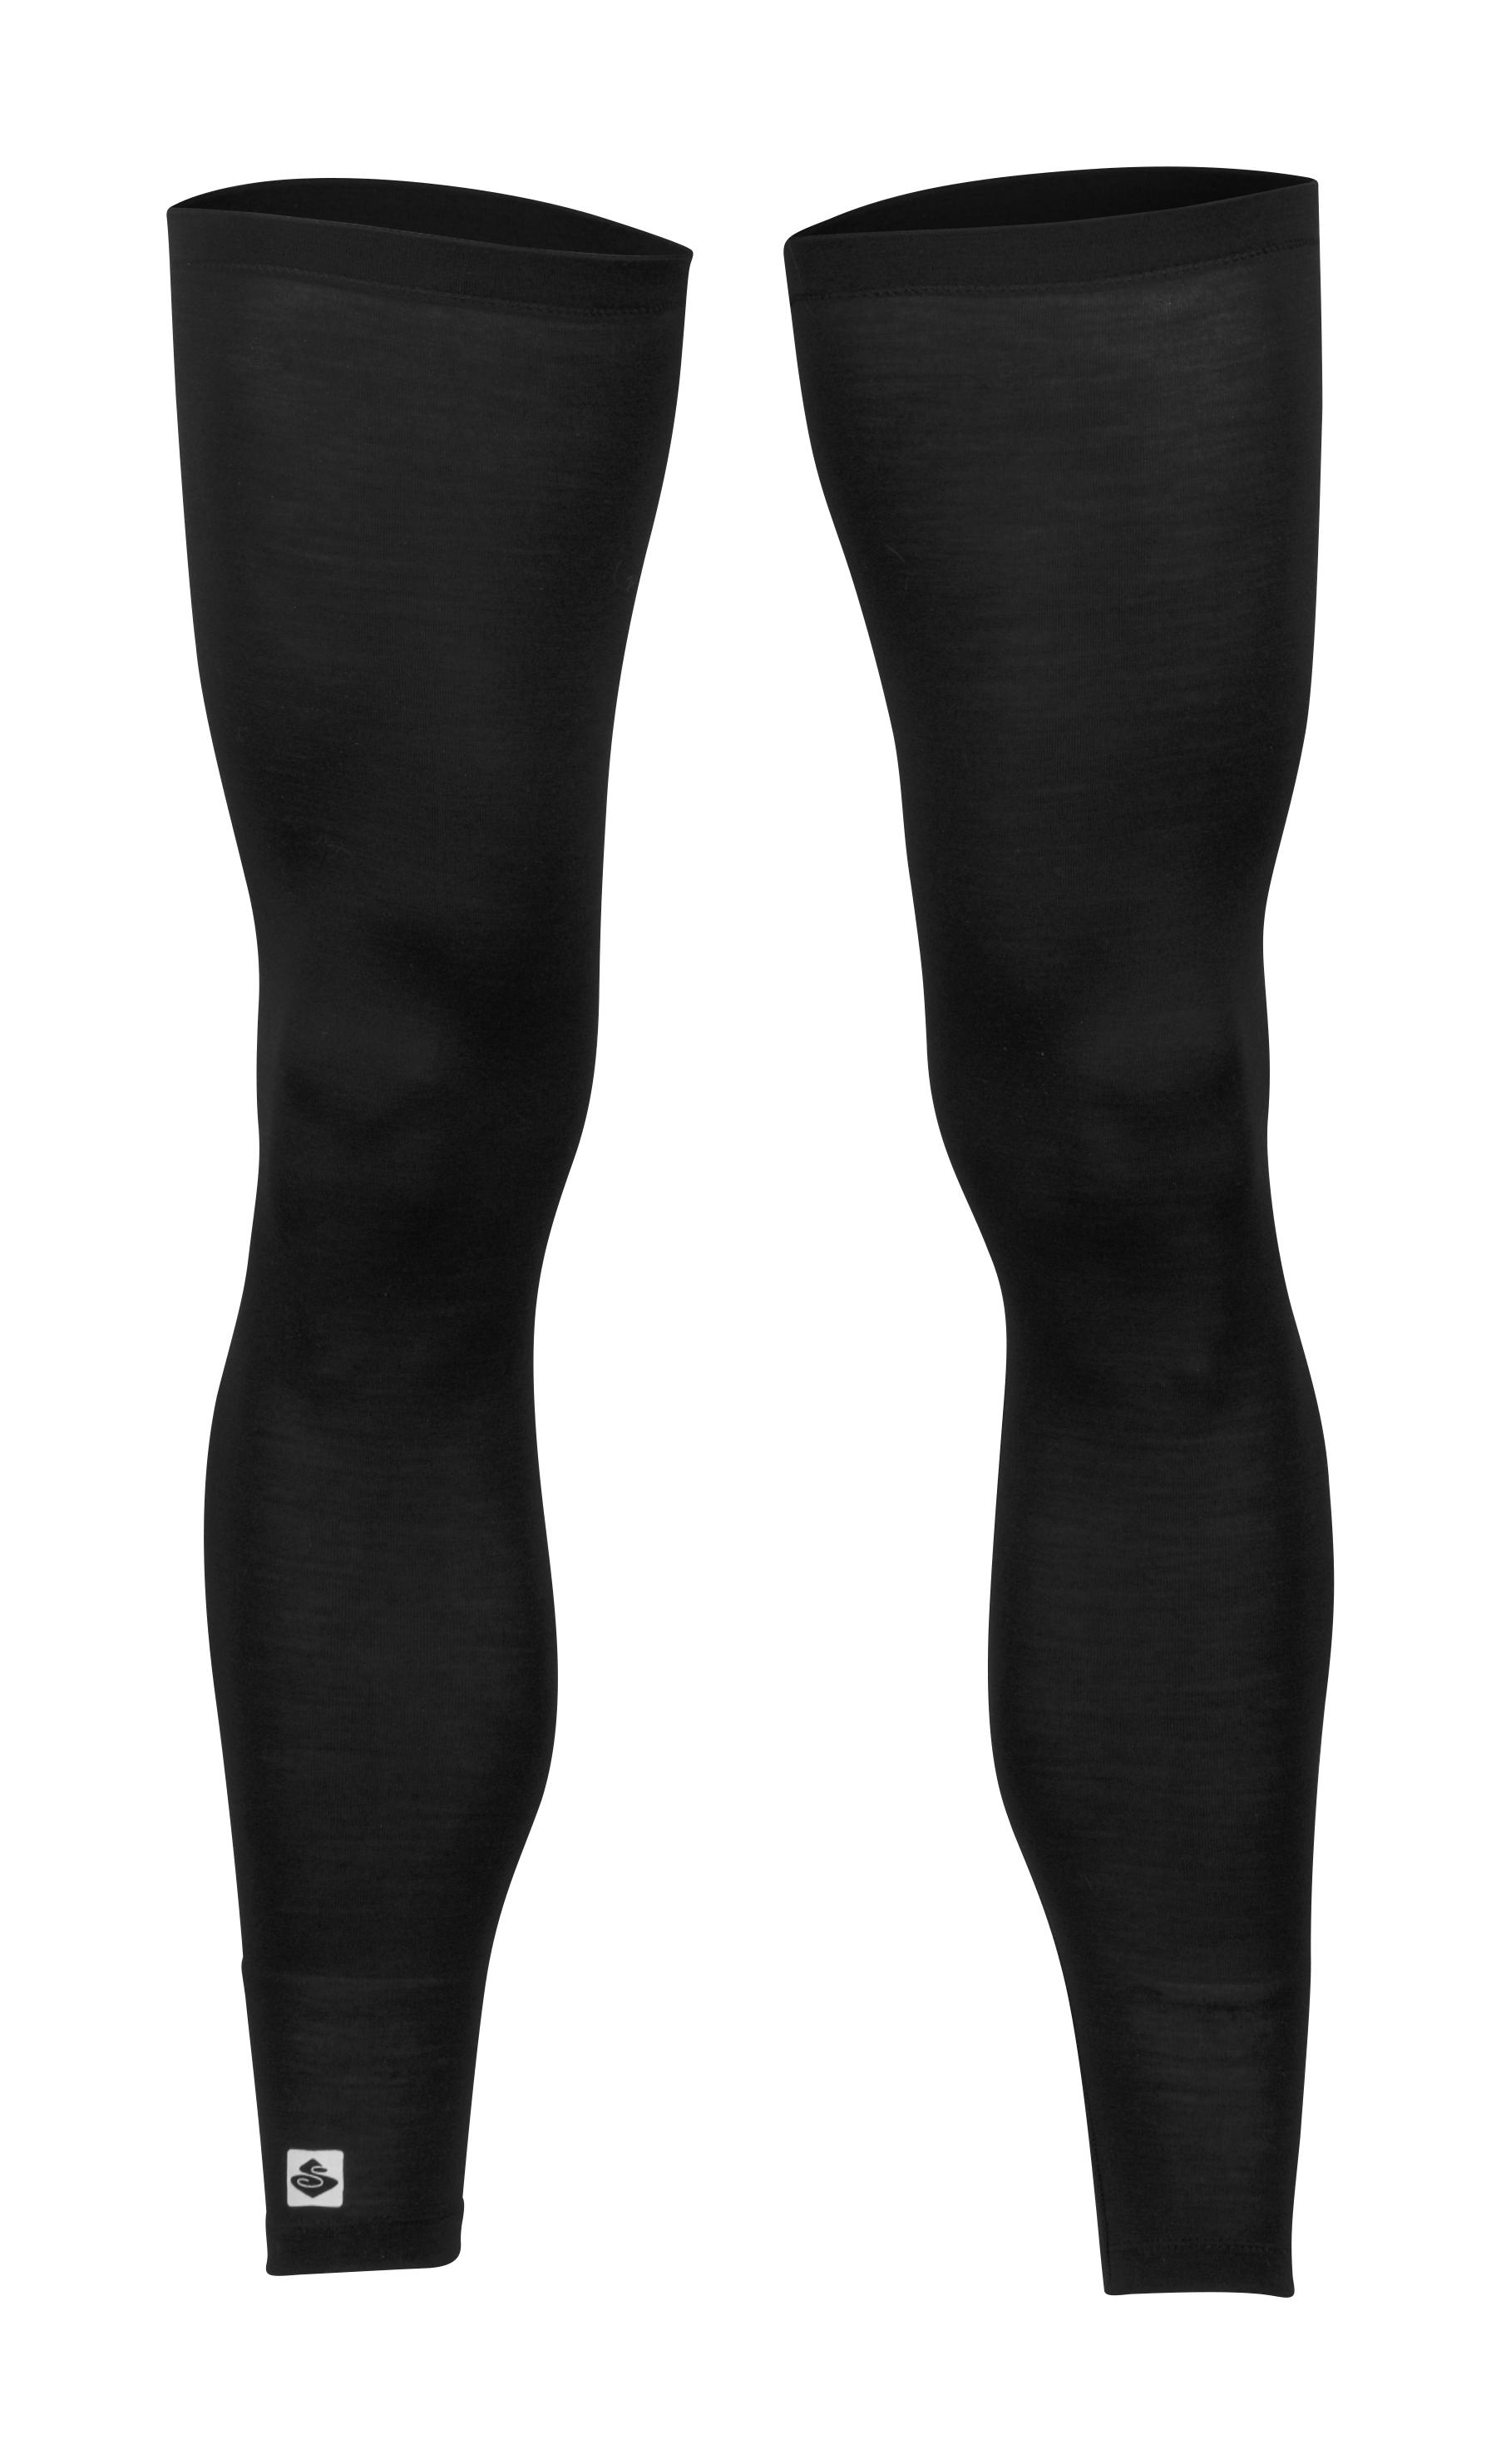 828049-crossfire_merino_legs-true_black-front.jpg